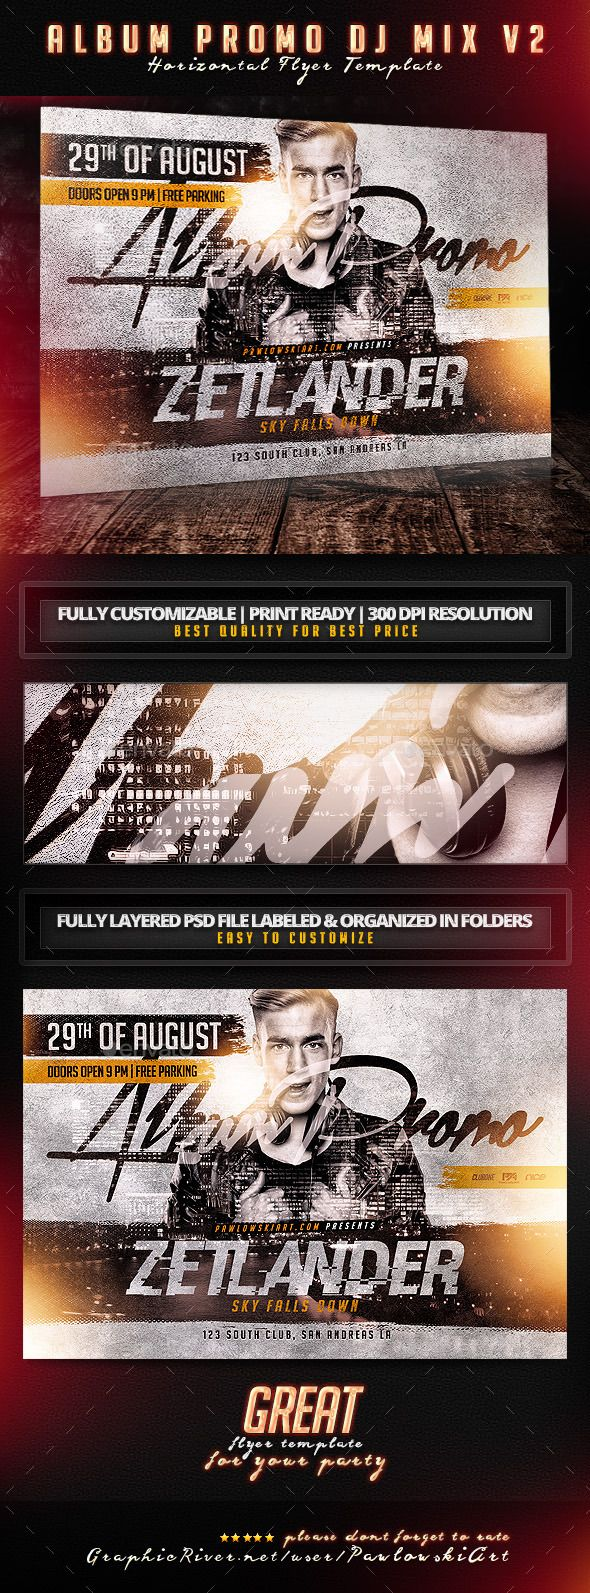 Album Promo DJ Mix v2 Horizontal Flyer Template - Concerts Events